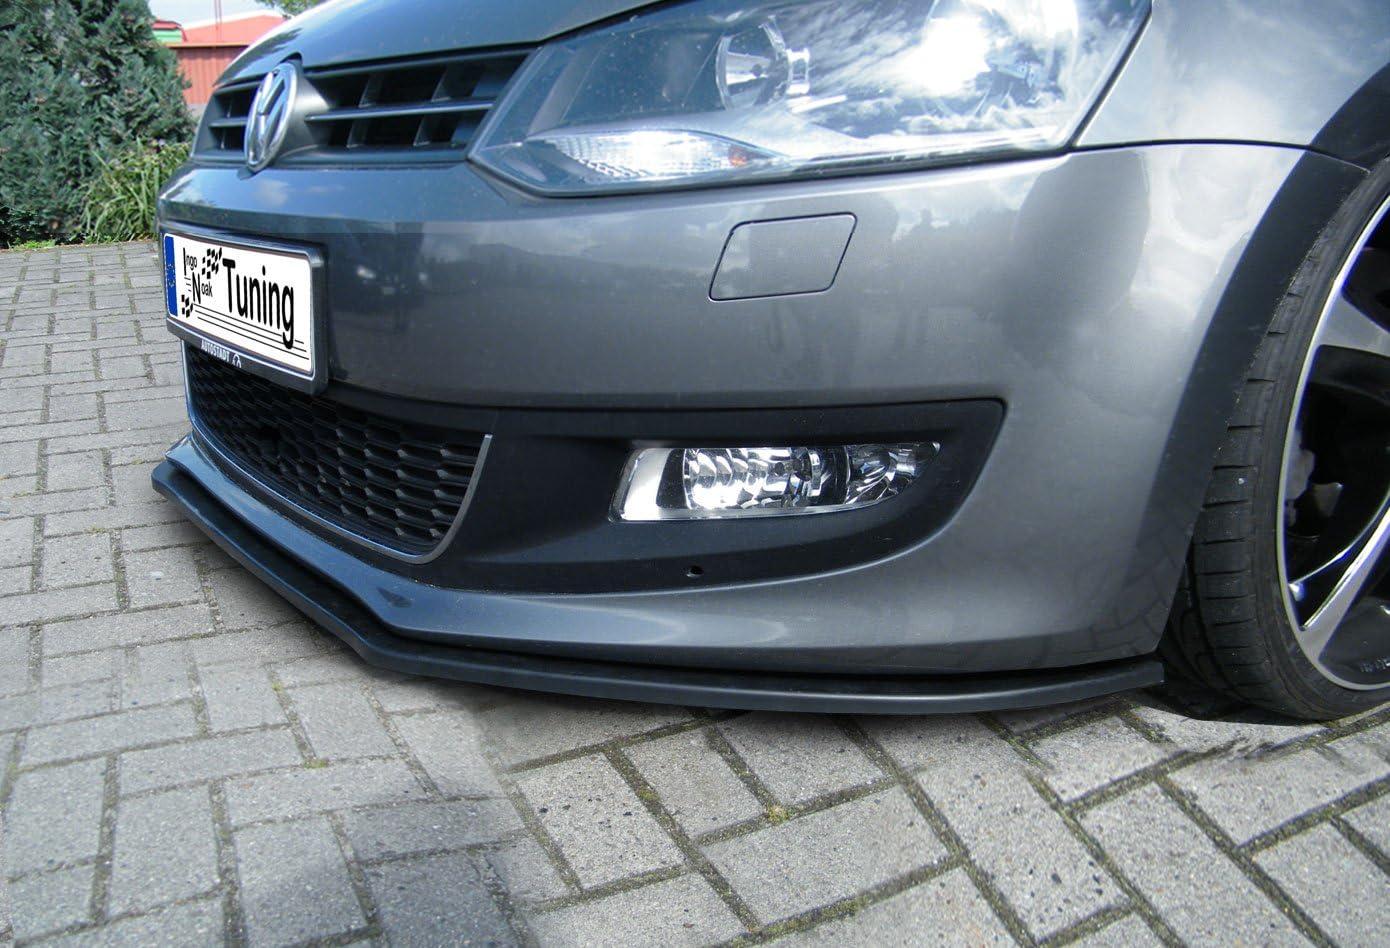 Ingo Noak Tuning Cup Frontspoilerlippe IN-290031-ABS,aus ABS hergestellt